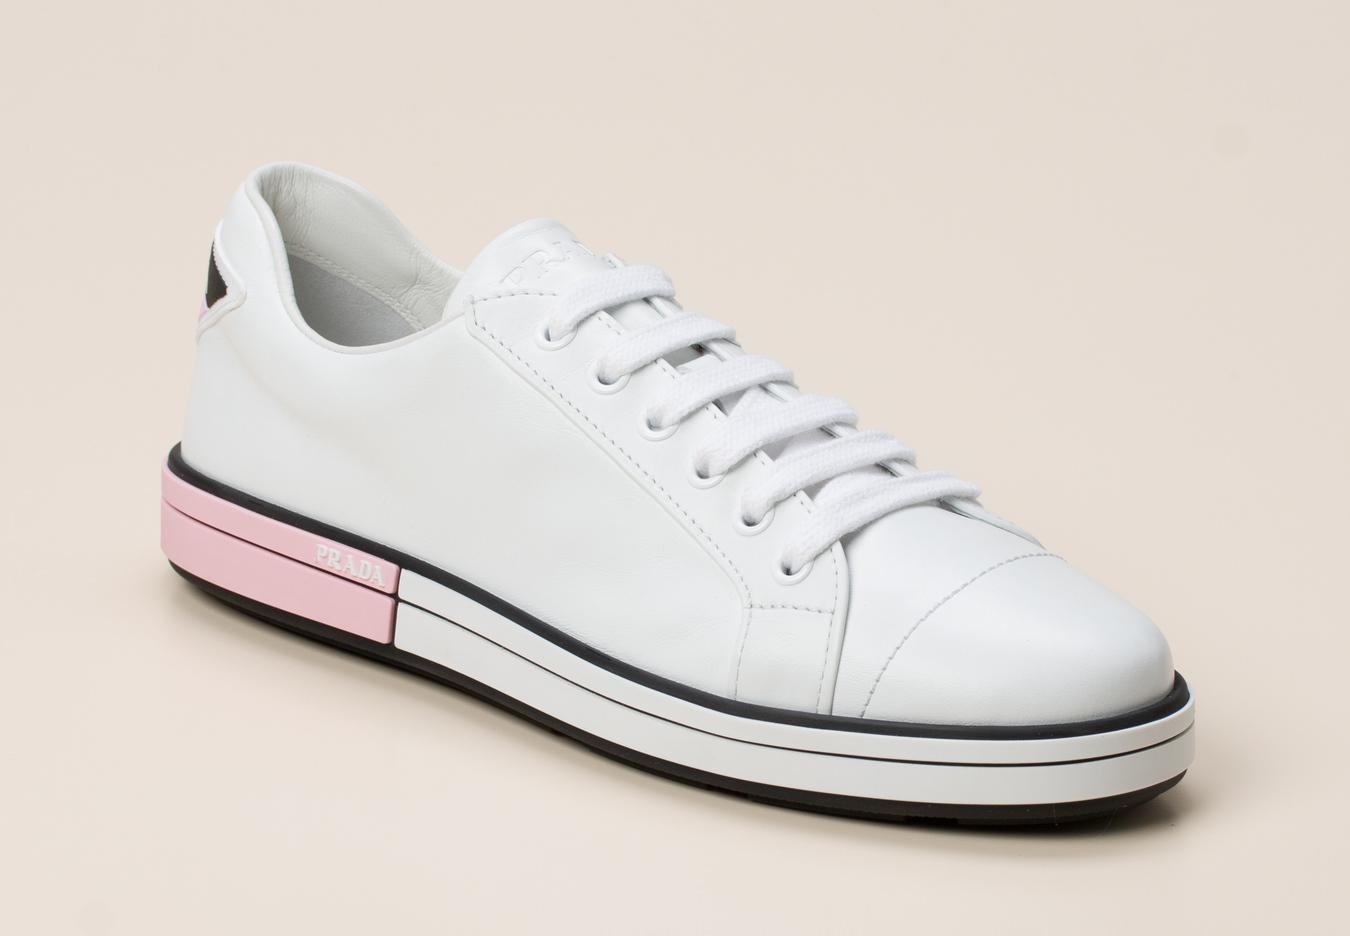 9e3fdf4c87459 Prada Damen Sneaker in weiß kaufen